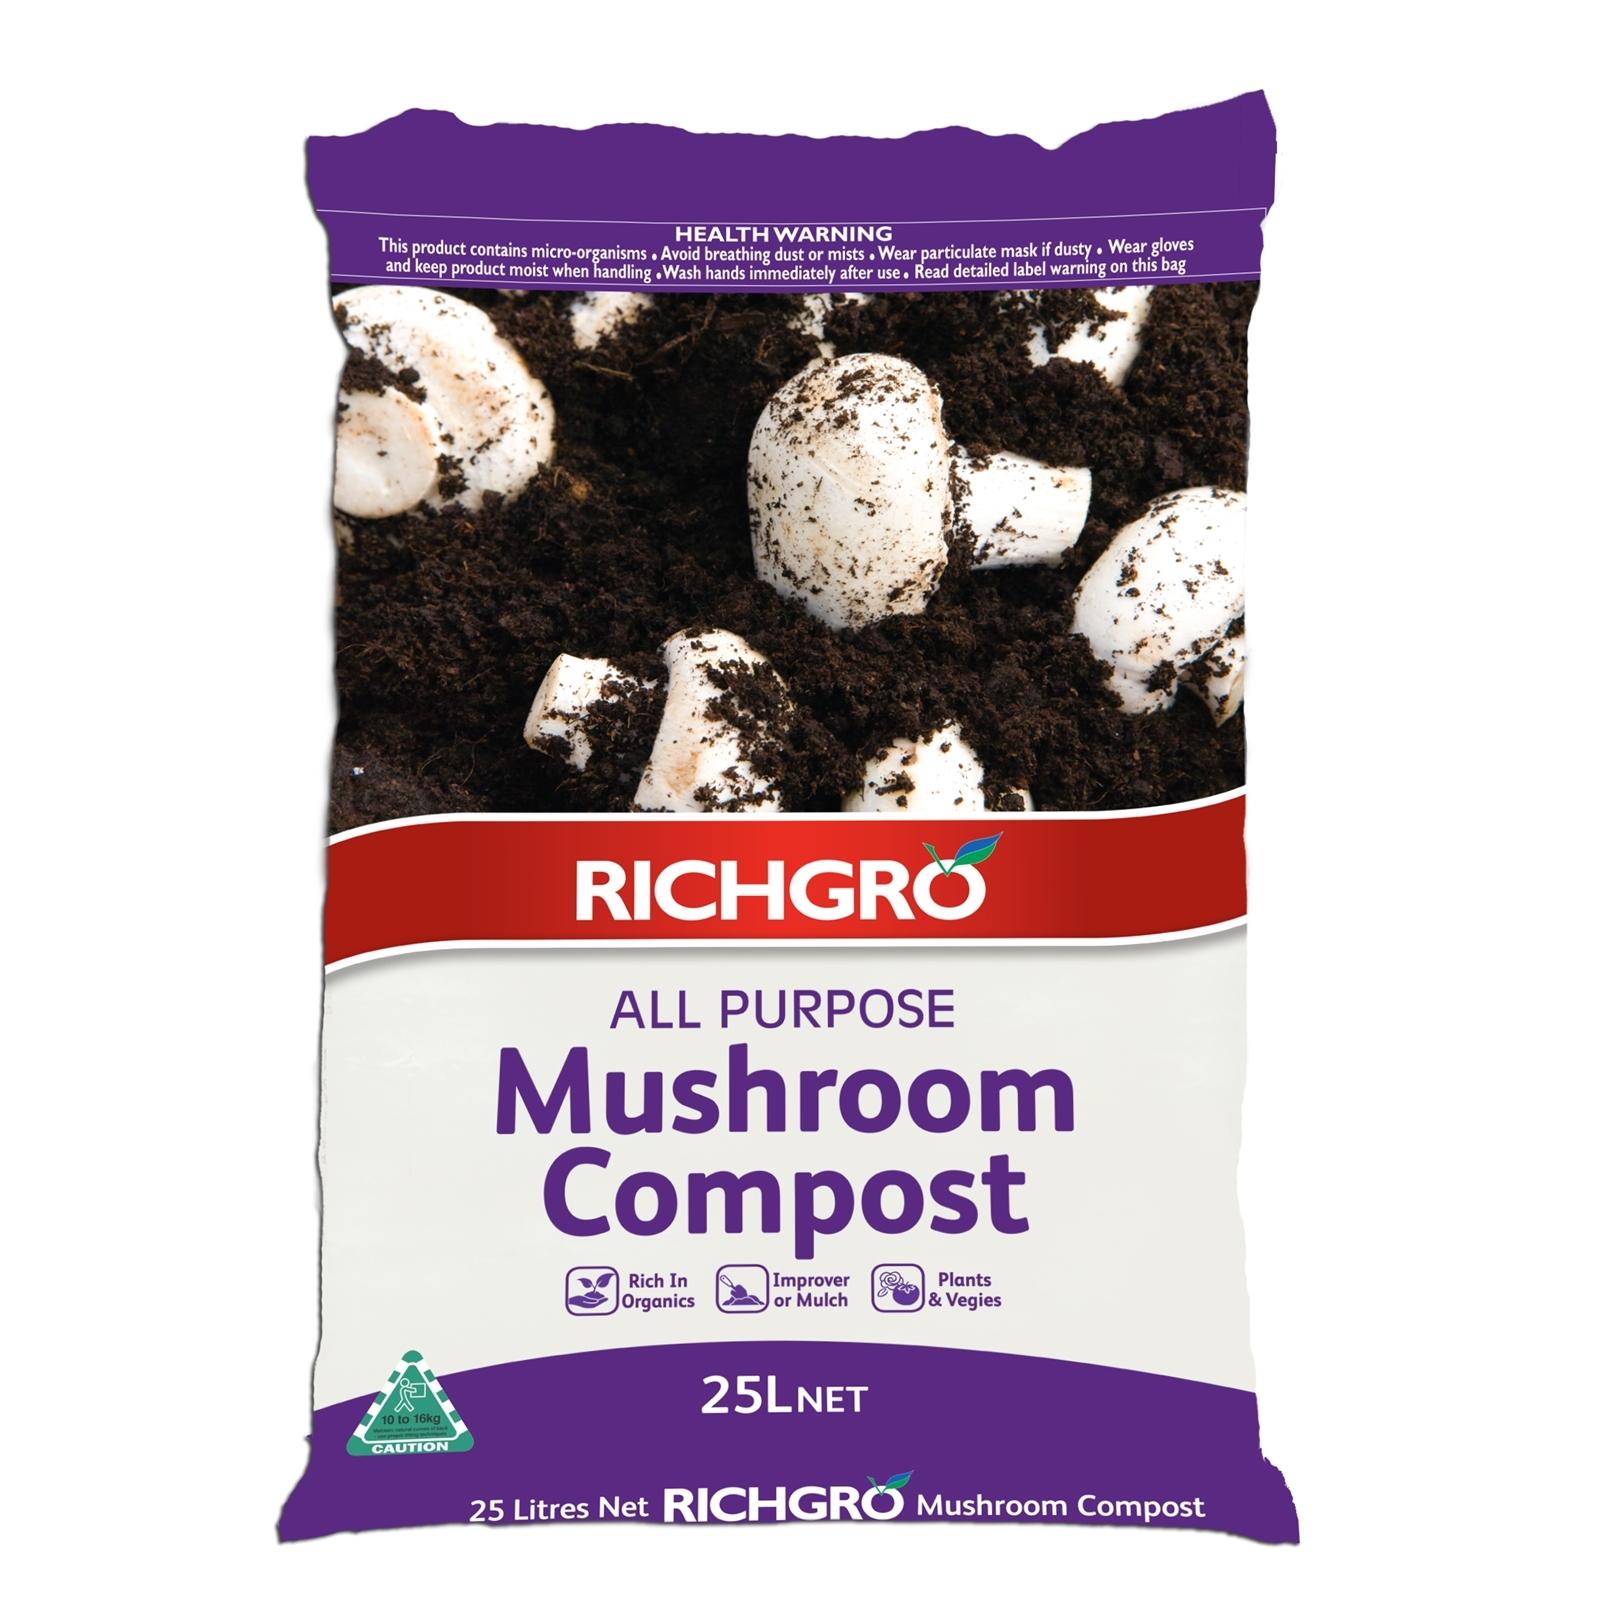 Richgro 25L All Purpose Mushroom Compost